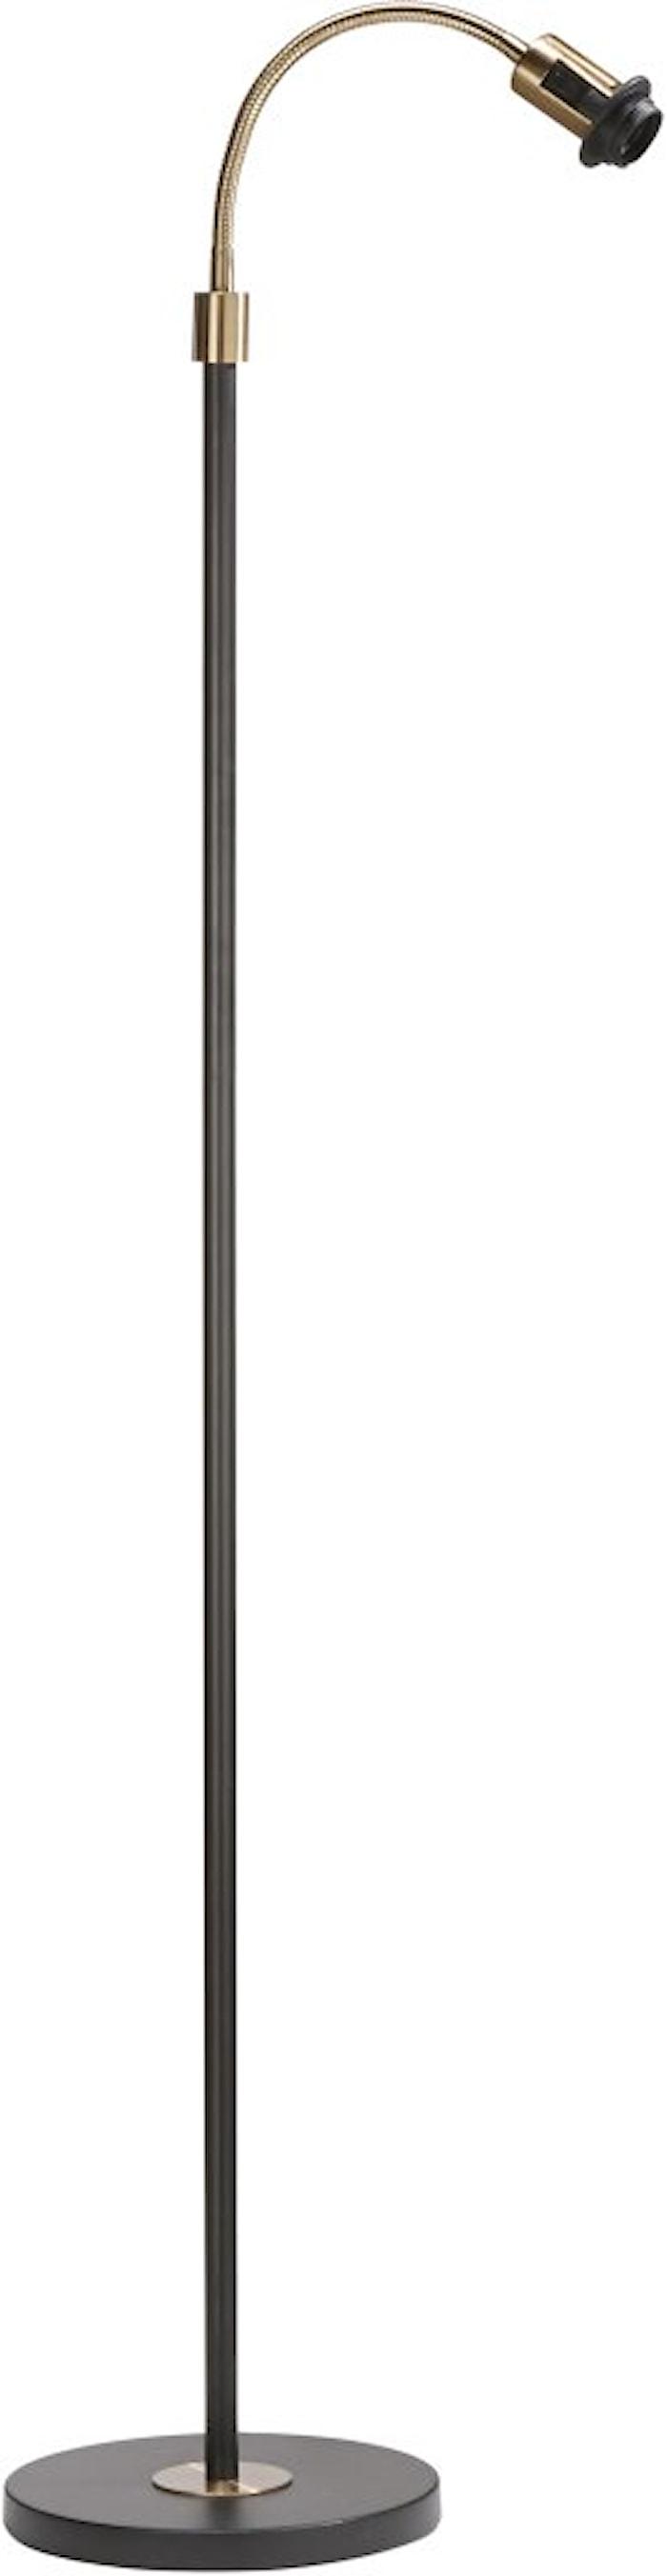 Cia Enarmet Gulvfot Svart/Messing 160cm